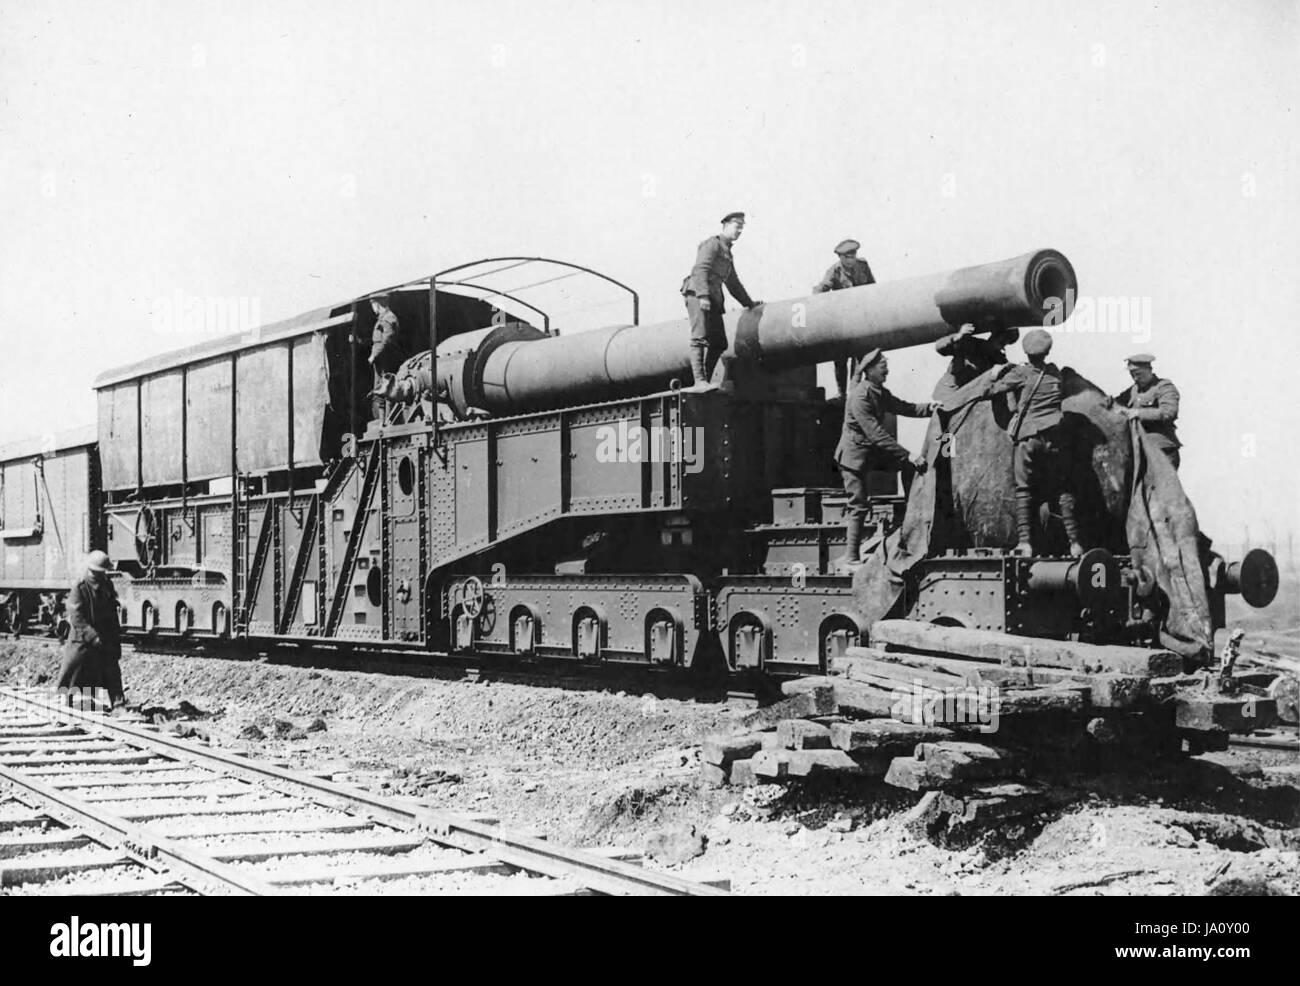 RAILWAY GUN. Armstrong Whitworth 12inch railway gun at Arras in 1917 - Stock Image